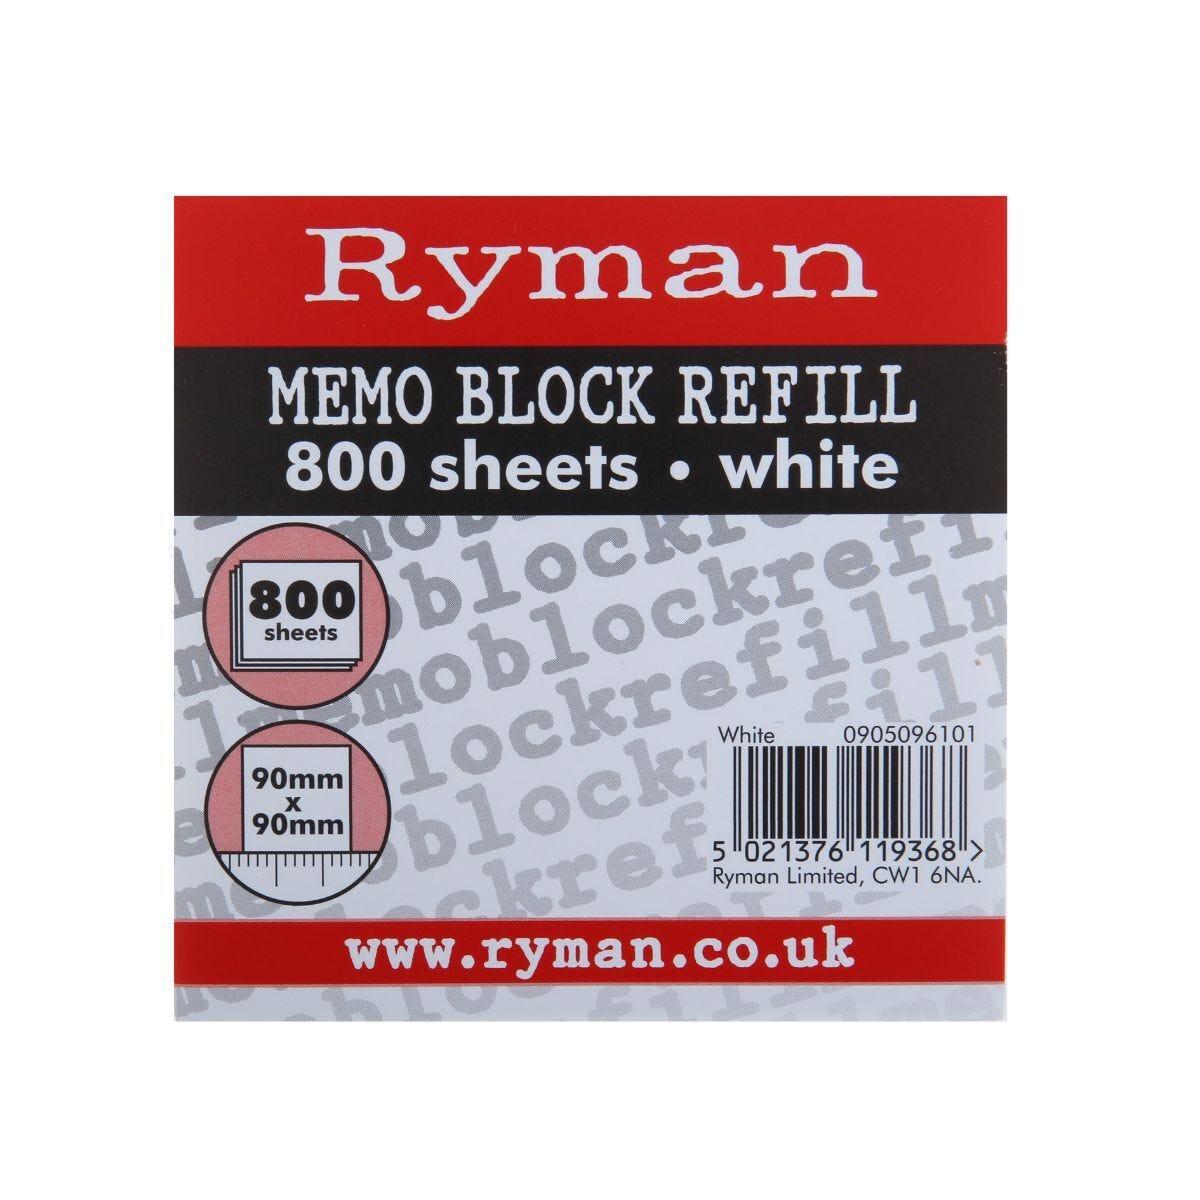 Ryman Paper Refill Block 75gsm 90x90 800 Sheets